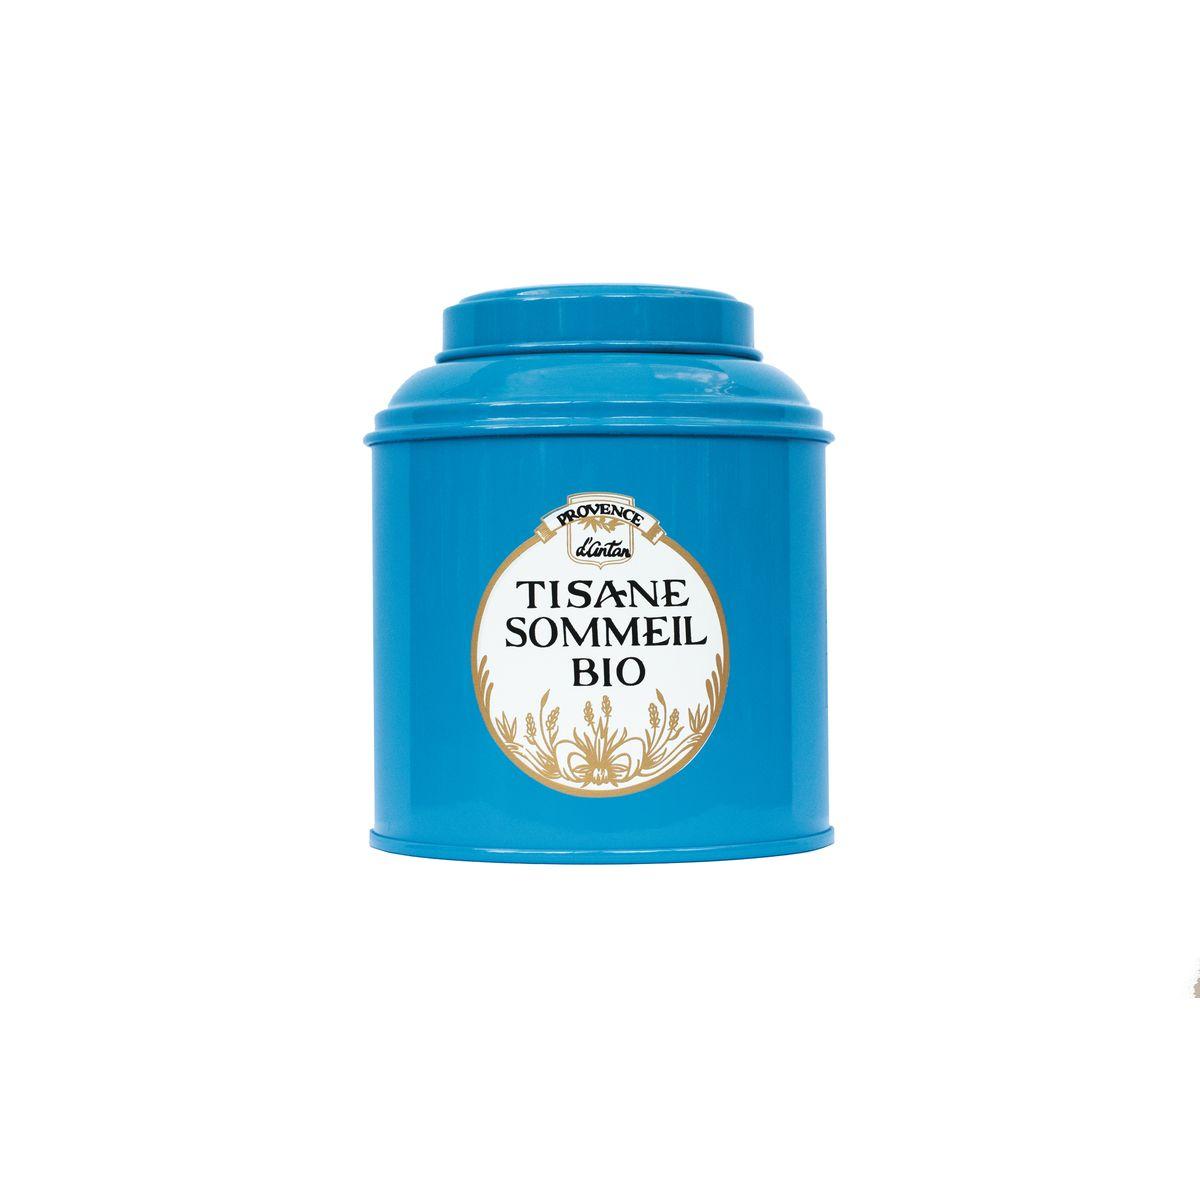 Tisane sommeil bio bm vrac 70 g - Provence d´Antan